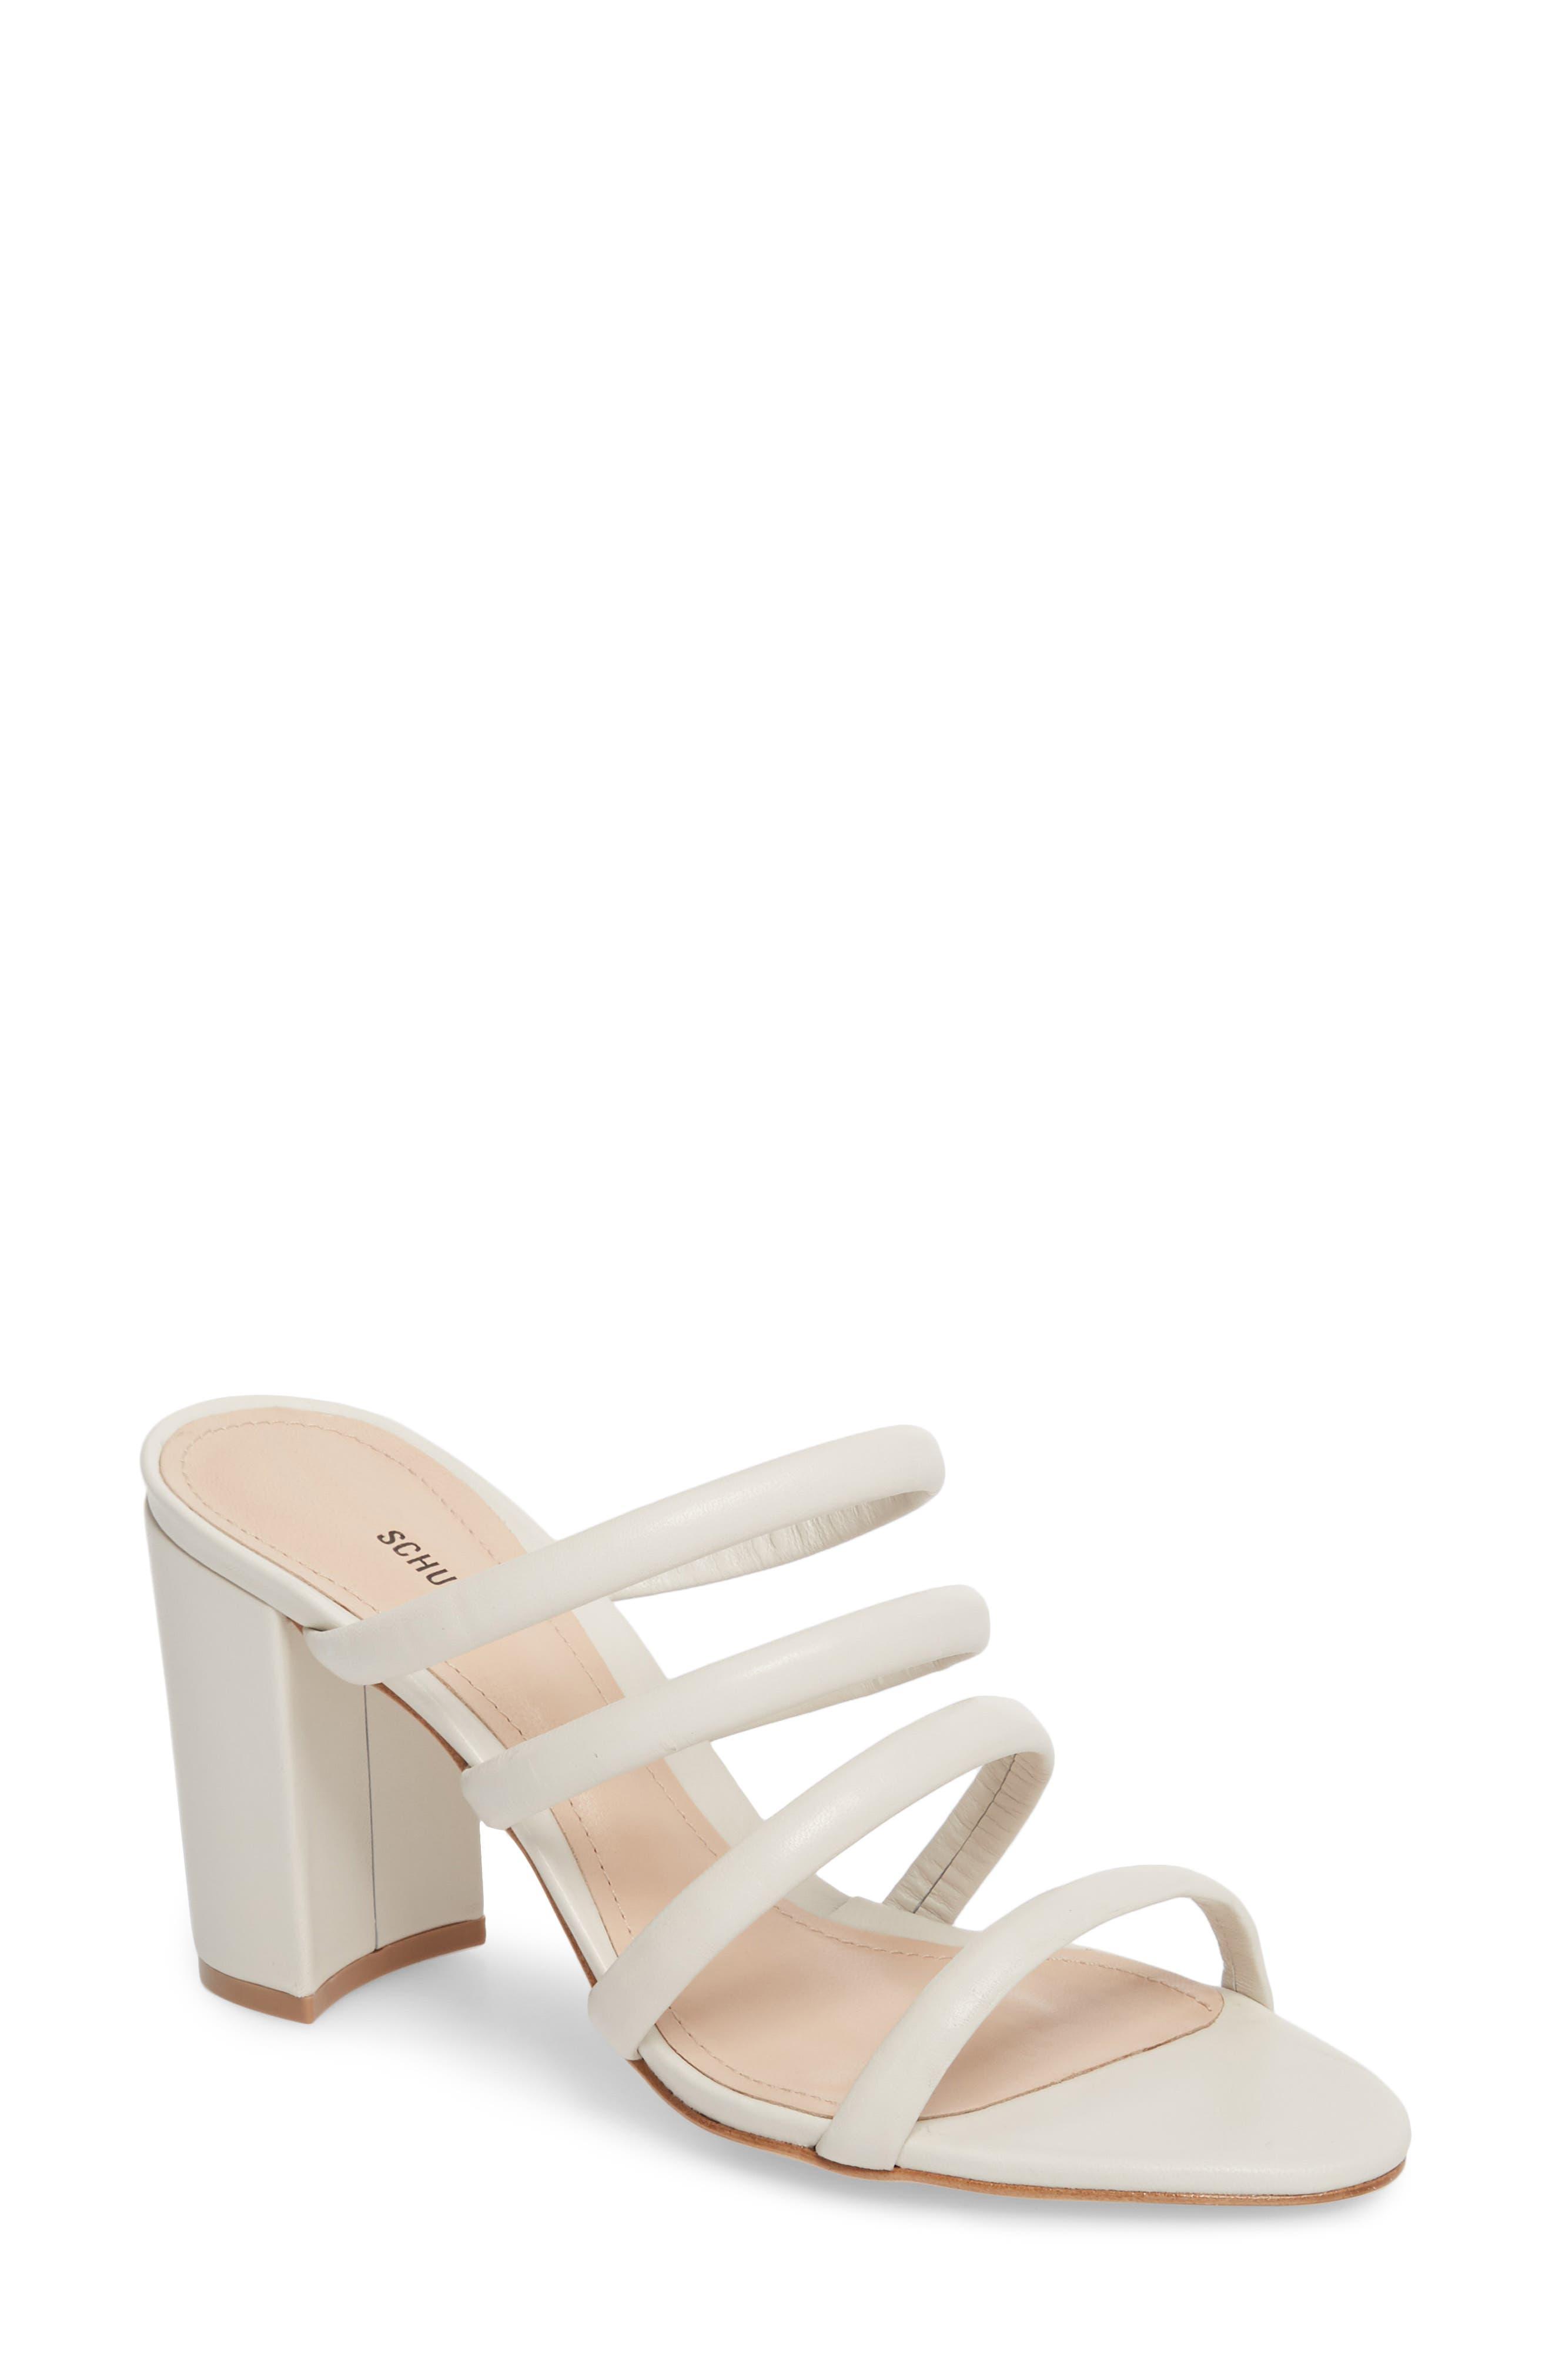 Felisa Block Heel Sandal,                         Main,                         color, 100